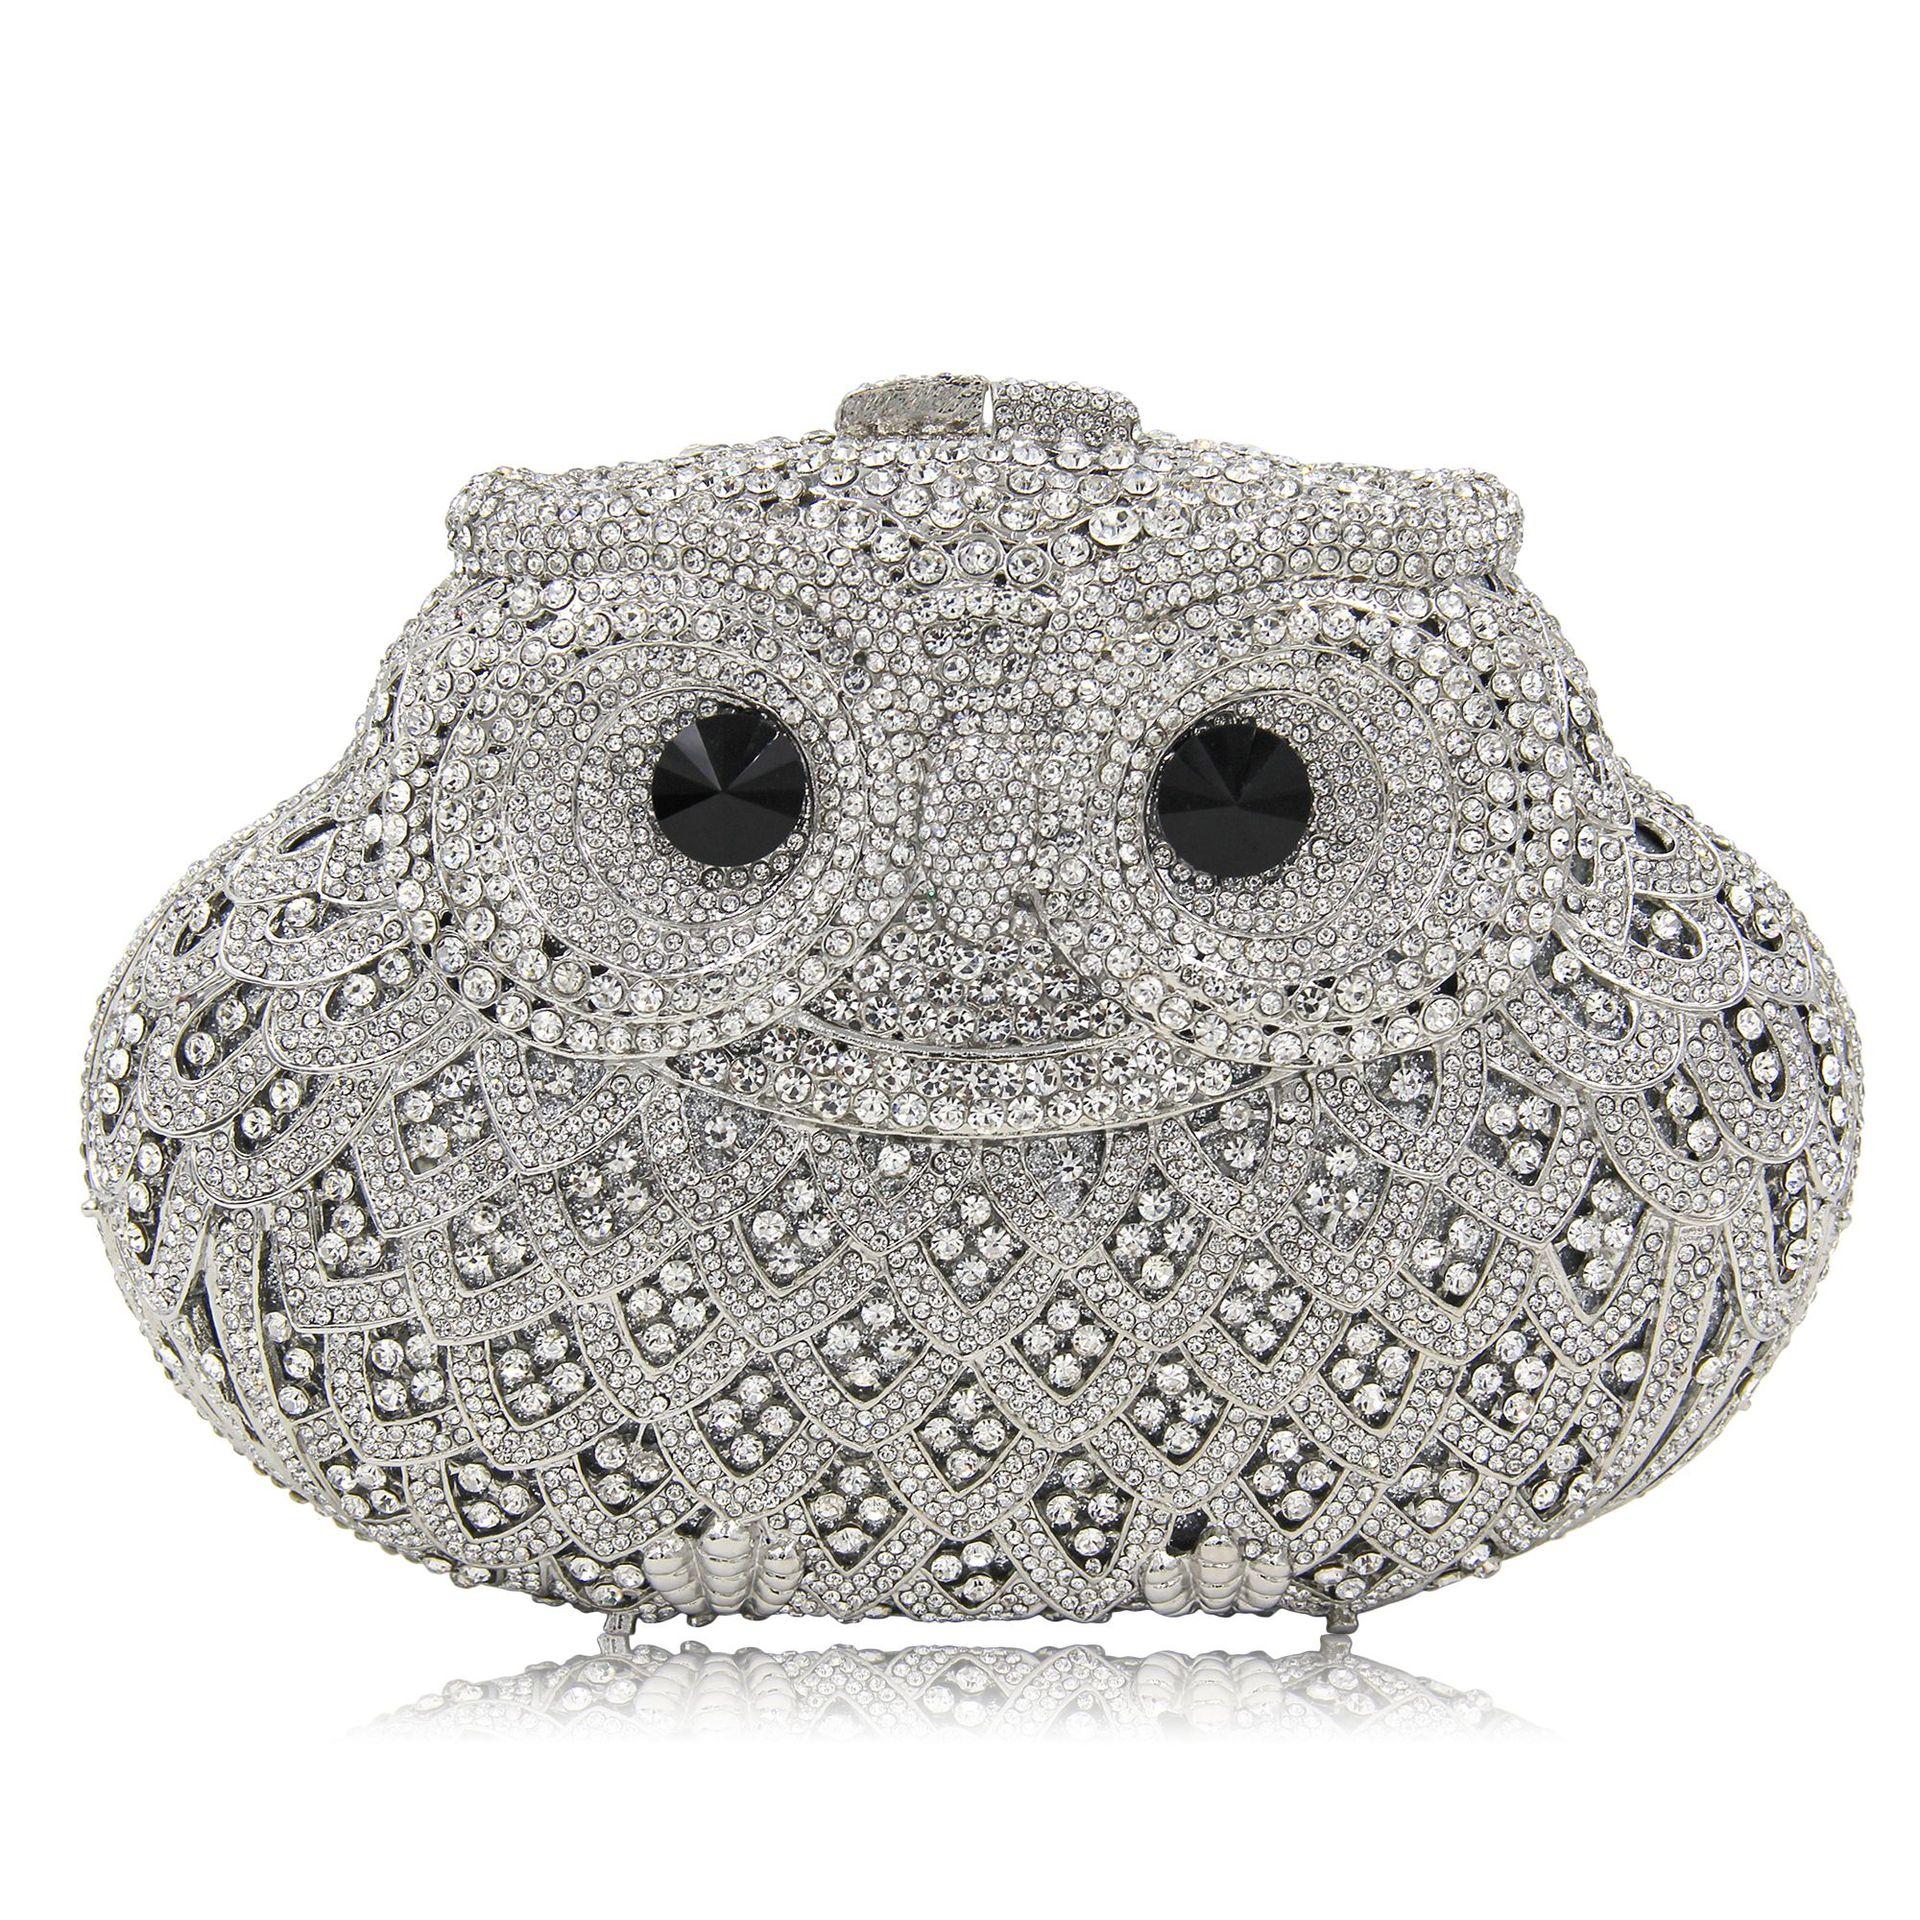 Bolsos de lujo con diseño de búho de diamantes para mujer, bolso de mano de alta calidad para fiesta de bodas borse da donna